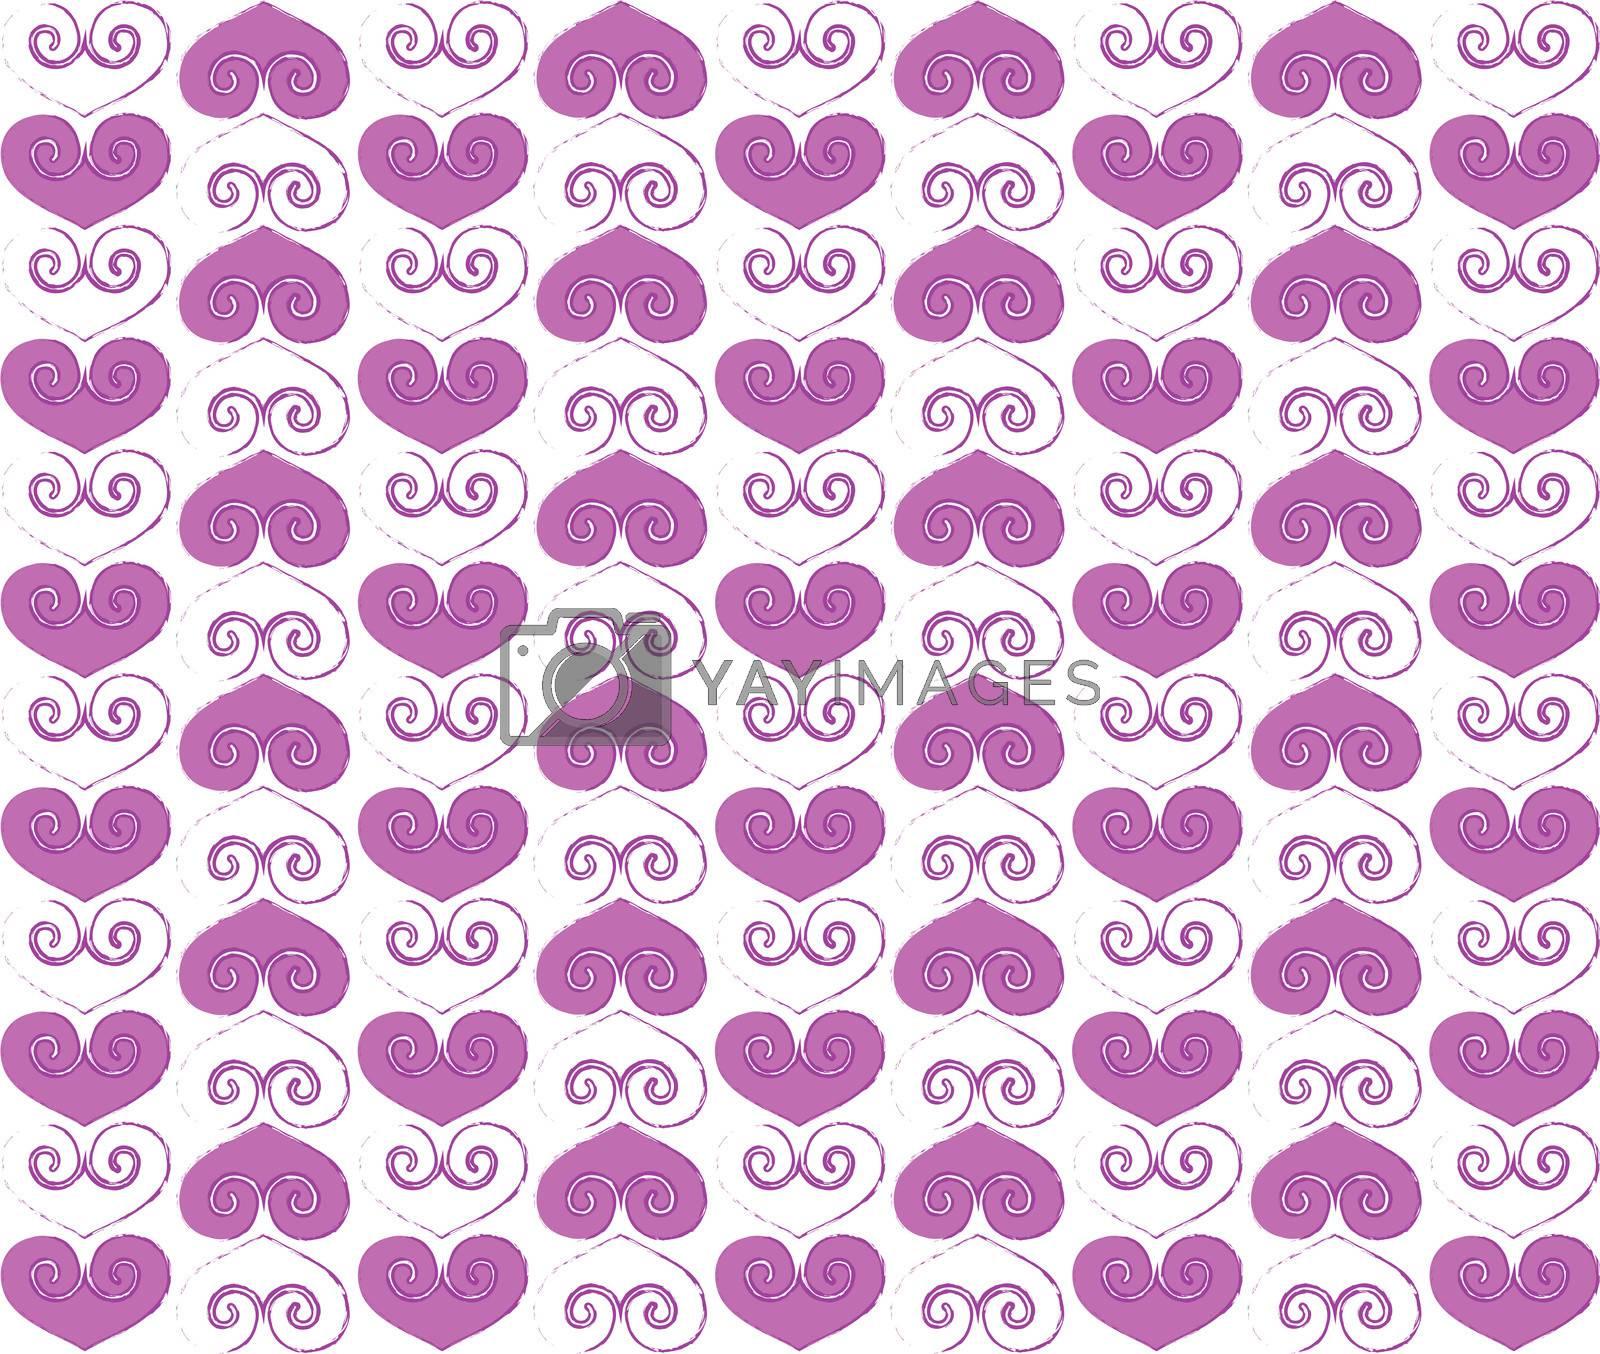 Valentine hearts design with purple color contours